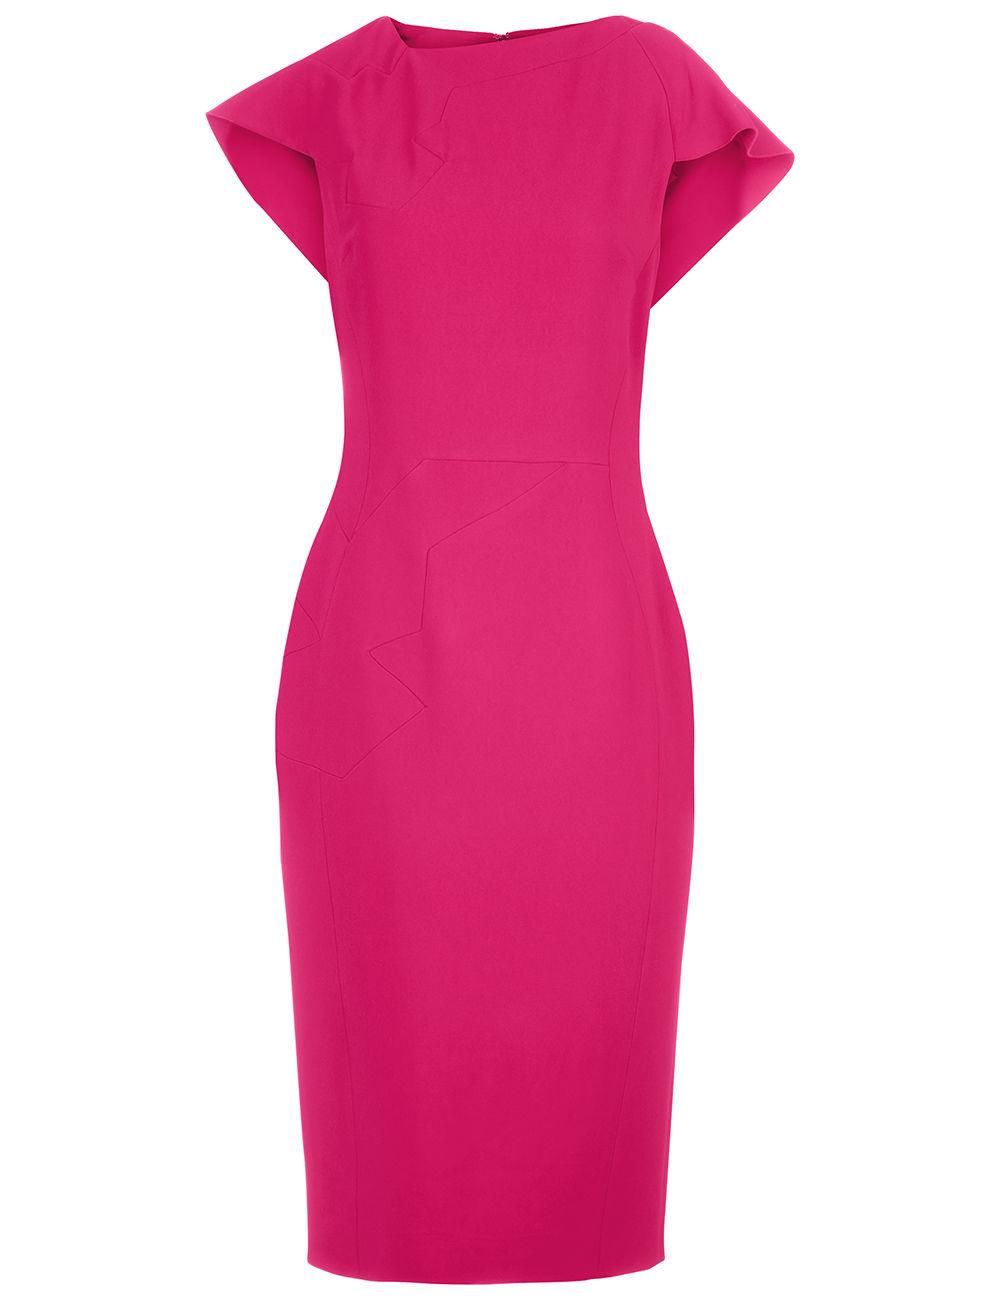 Antonio Berardi - Raspberry Cape Sleeve Midi Dress